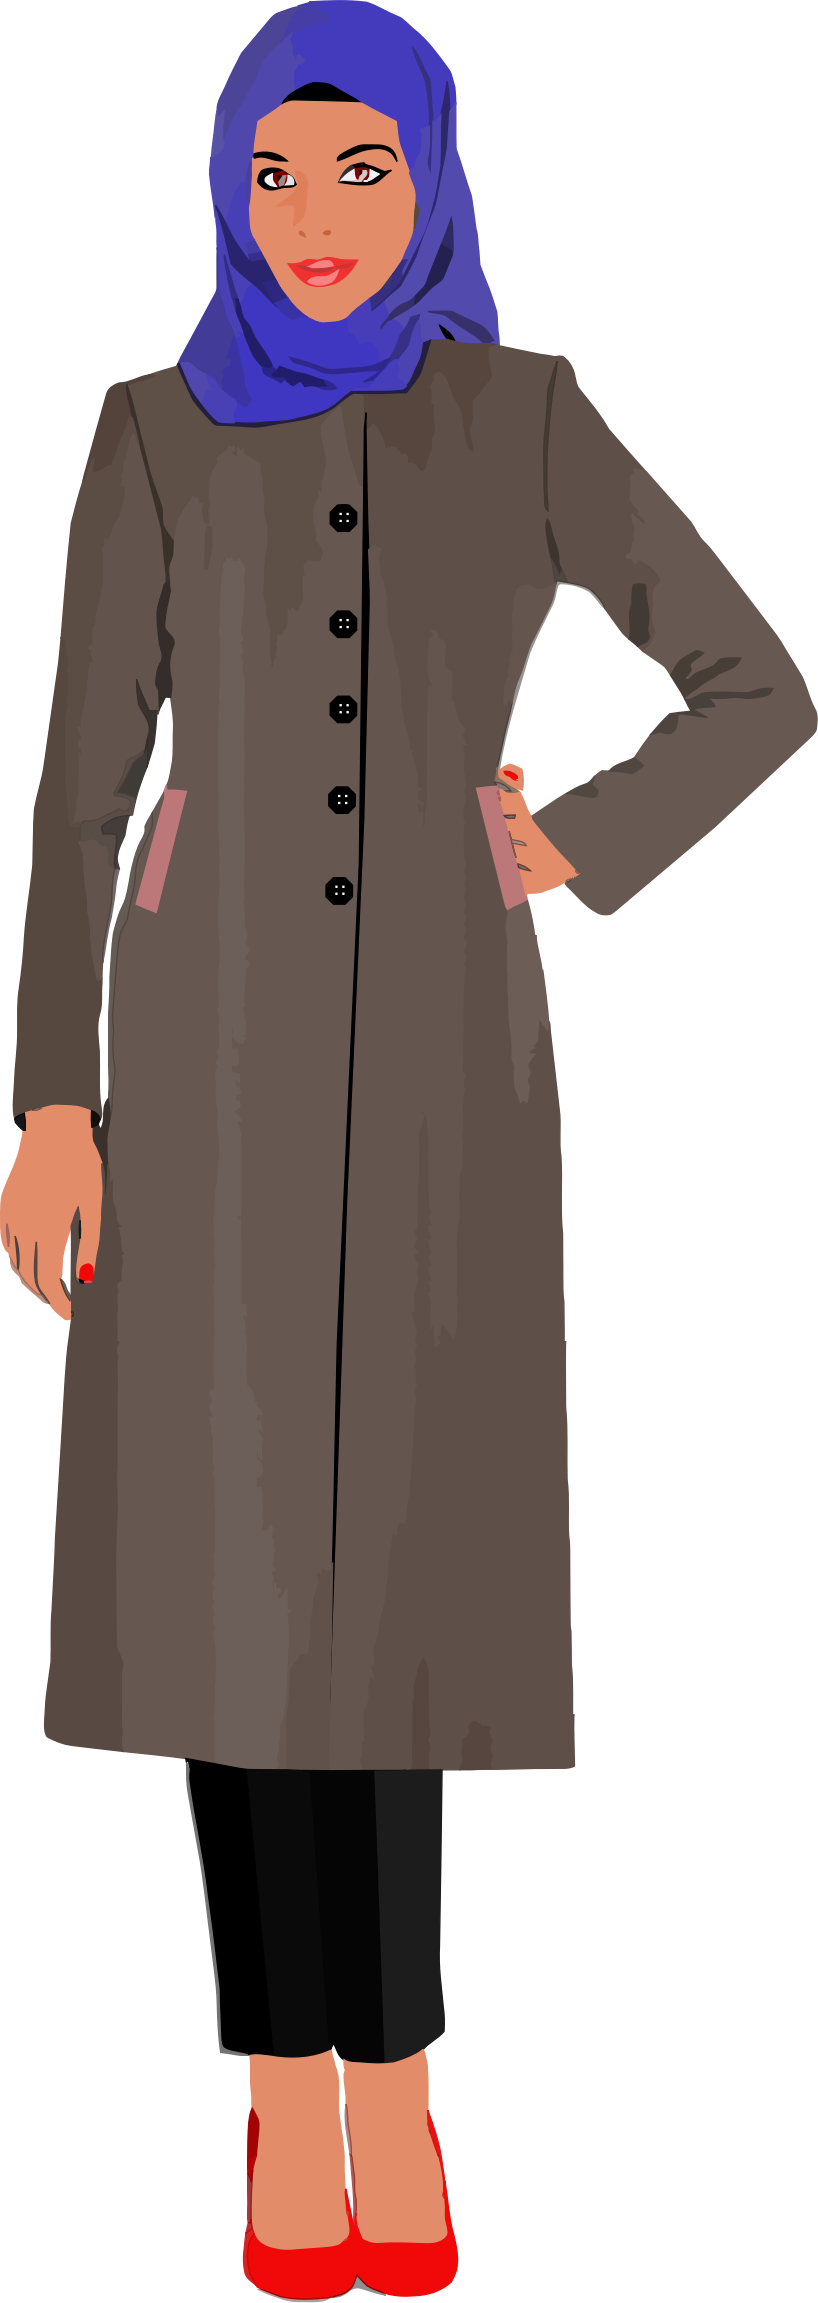 Muslim woman by gdj. Female clipart teacher